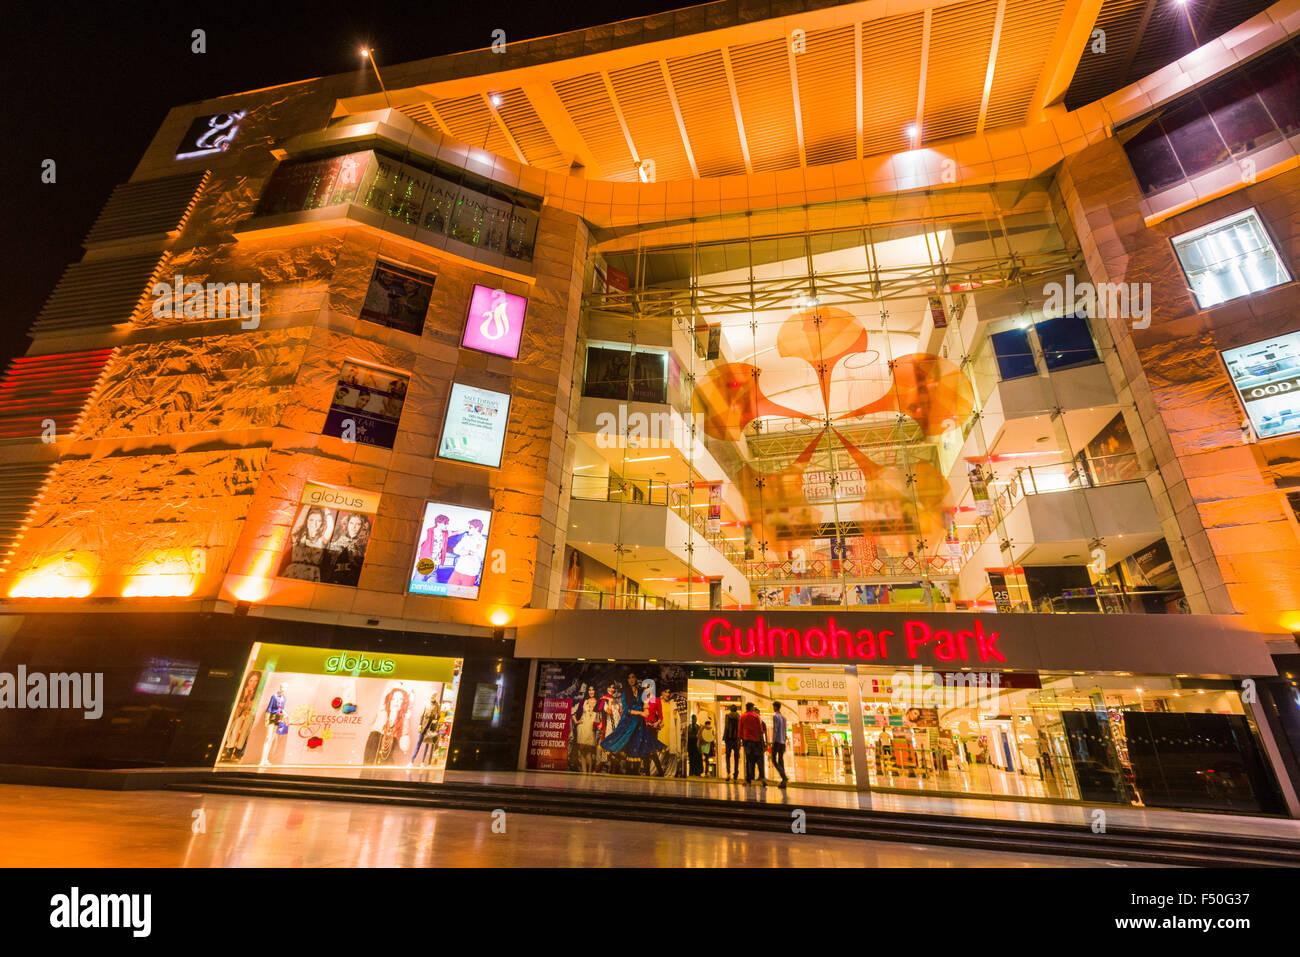 The entrance of the illuminated modern shopping mall Gulmohar Park at night - Stock Image